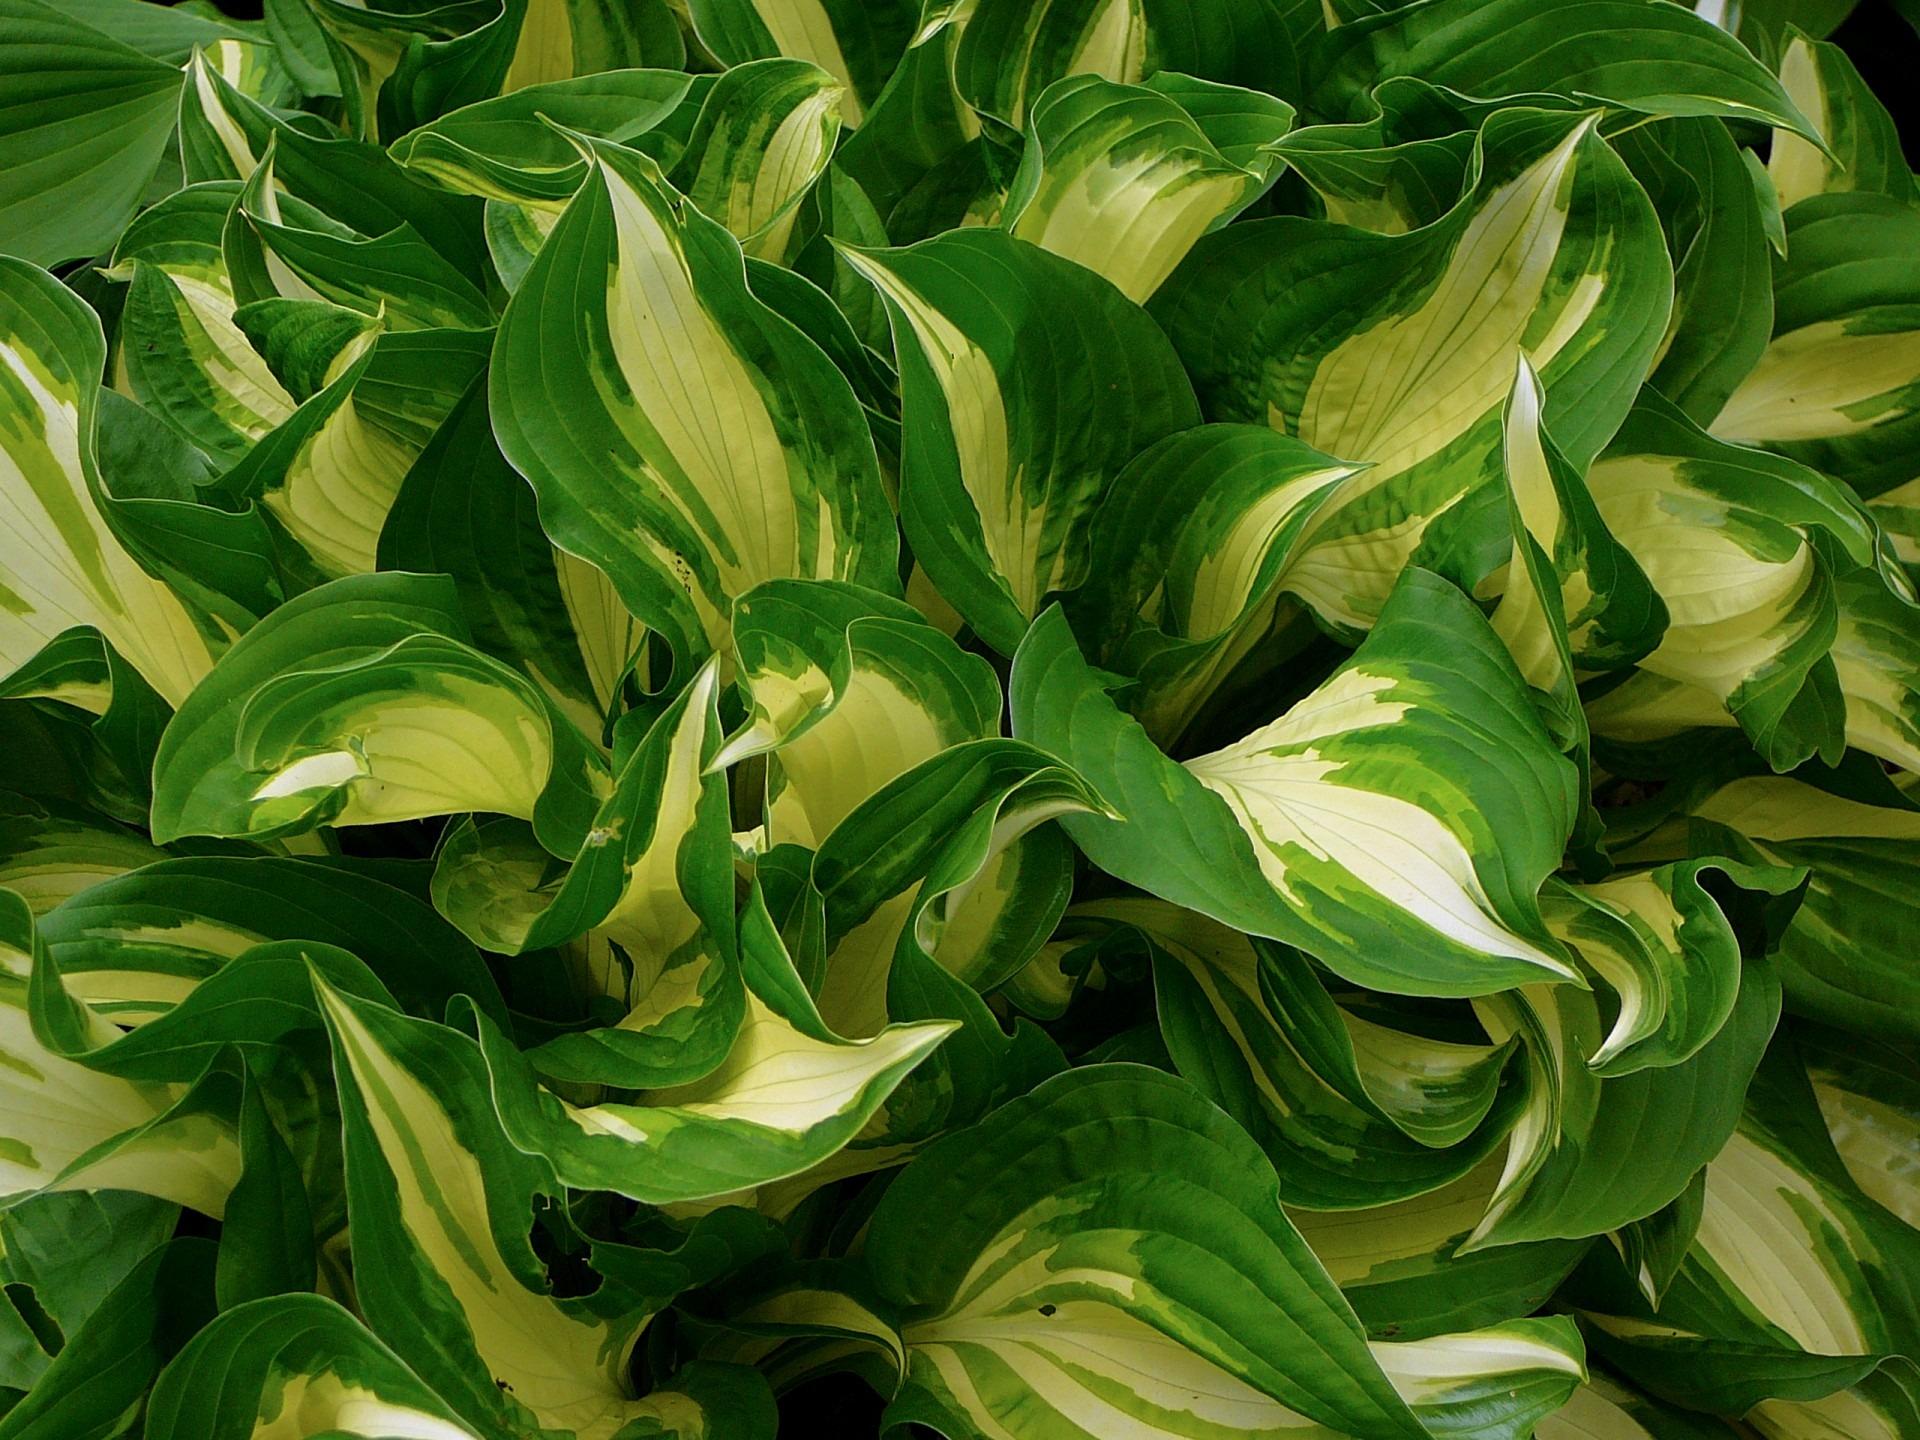 Free Images Nature Texture Leaf Flower Summer Foliage Food